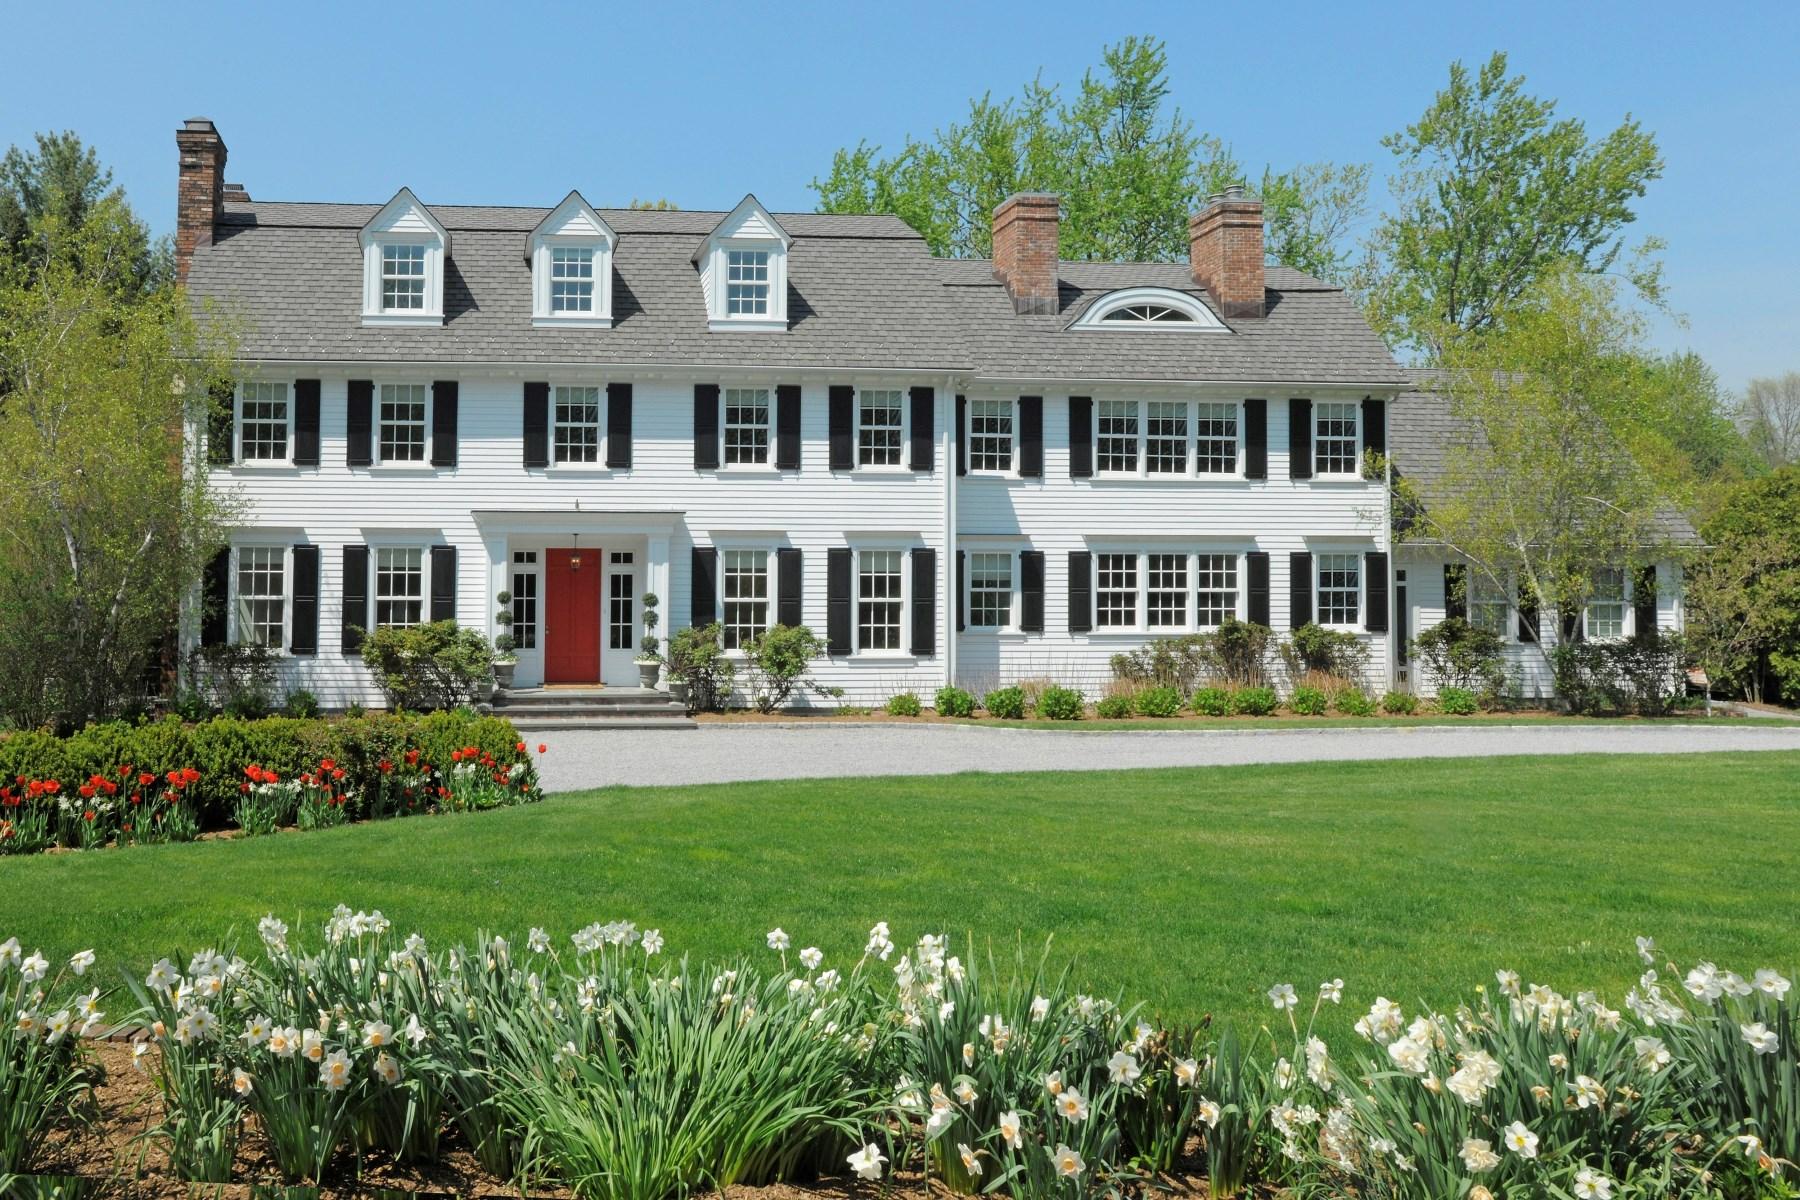 Tek Ailelik Ev için Satış at Beauty in Belle Haven 3 Meadow Wood Drive Greenwich, Connecticut 06830 Amerika Birleşik Devletleri